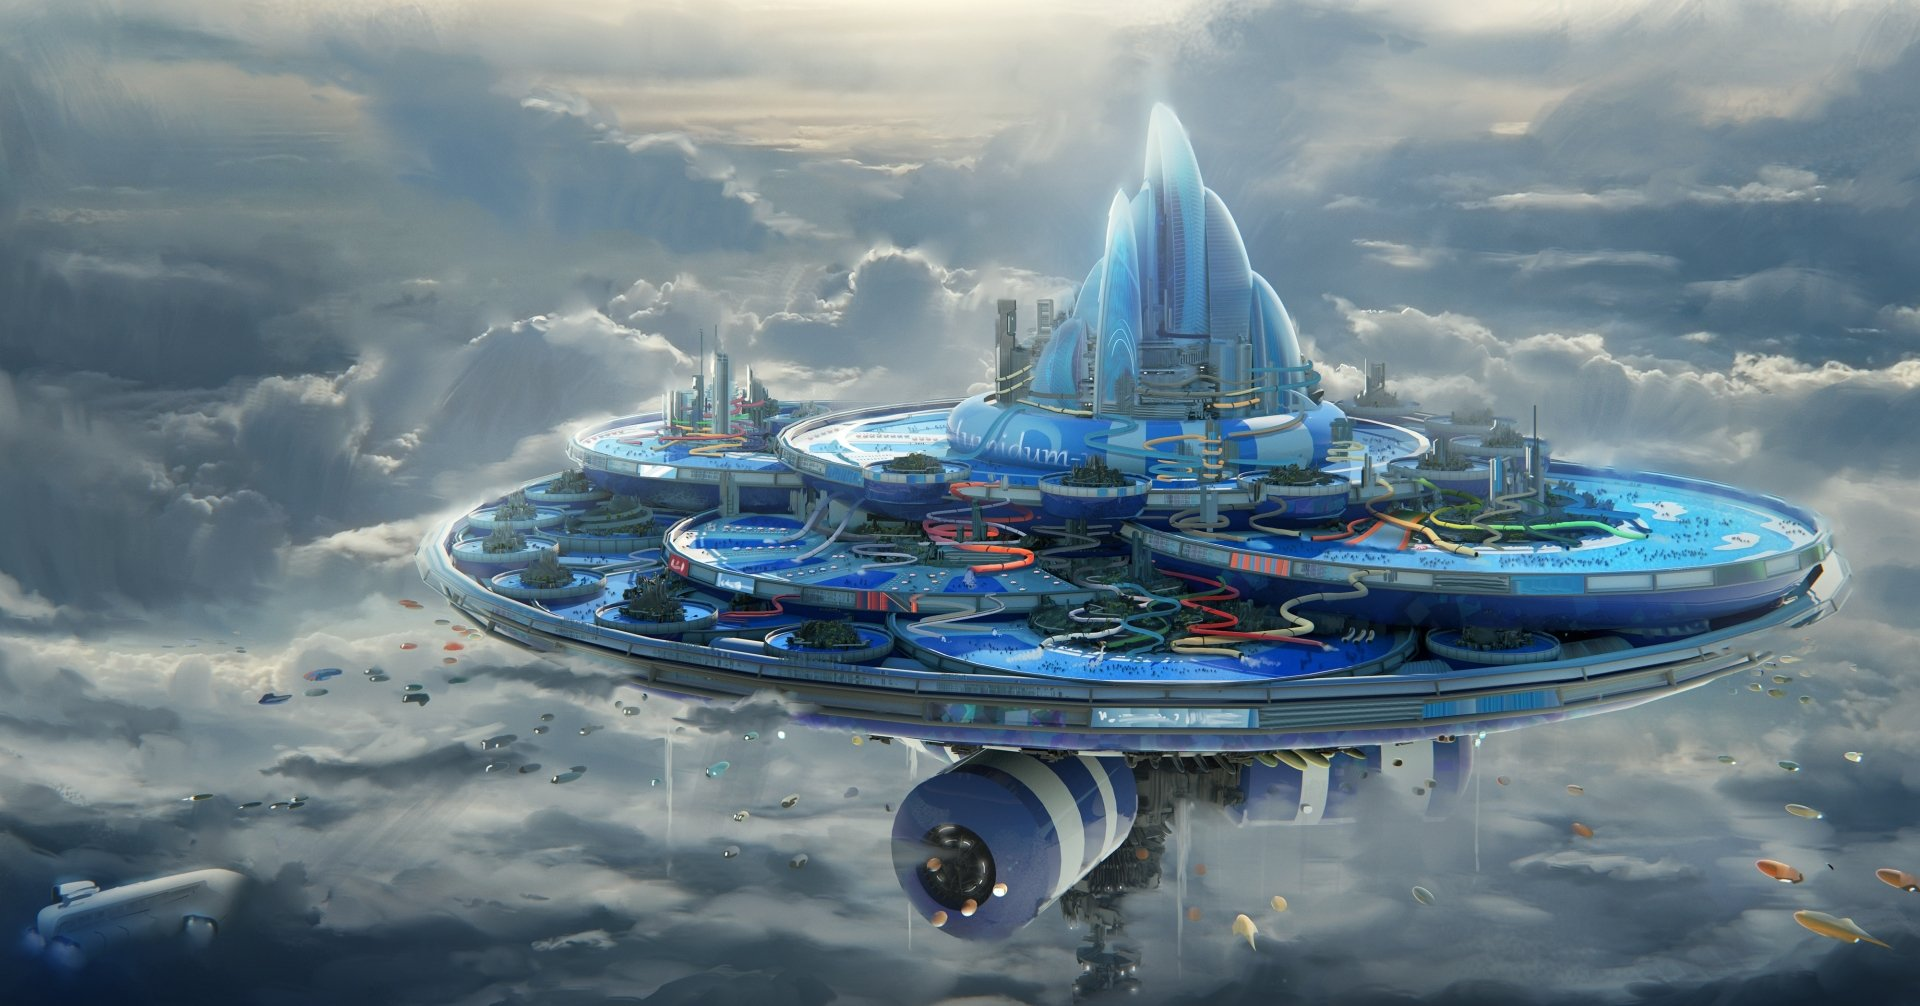 Sci Fi - City  Floating Island Cloud Aircraft Futuristic Wallpaper